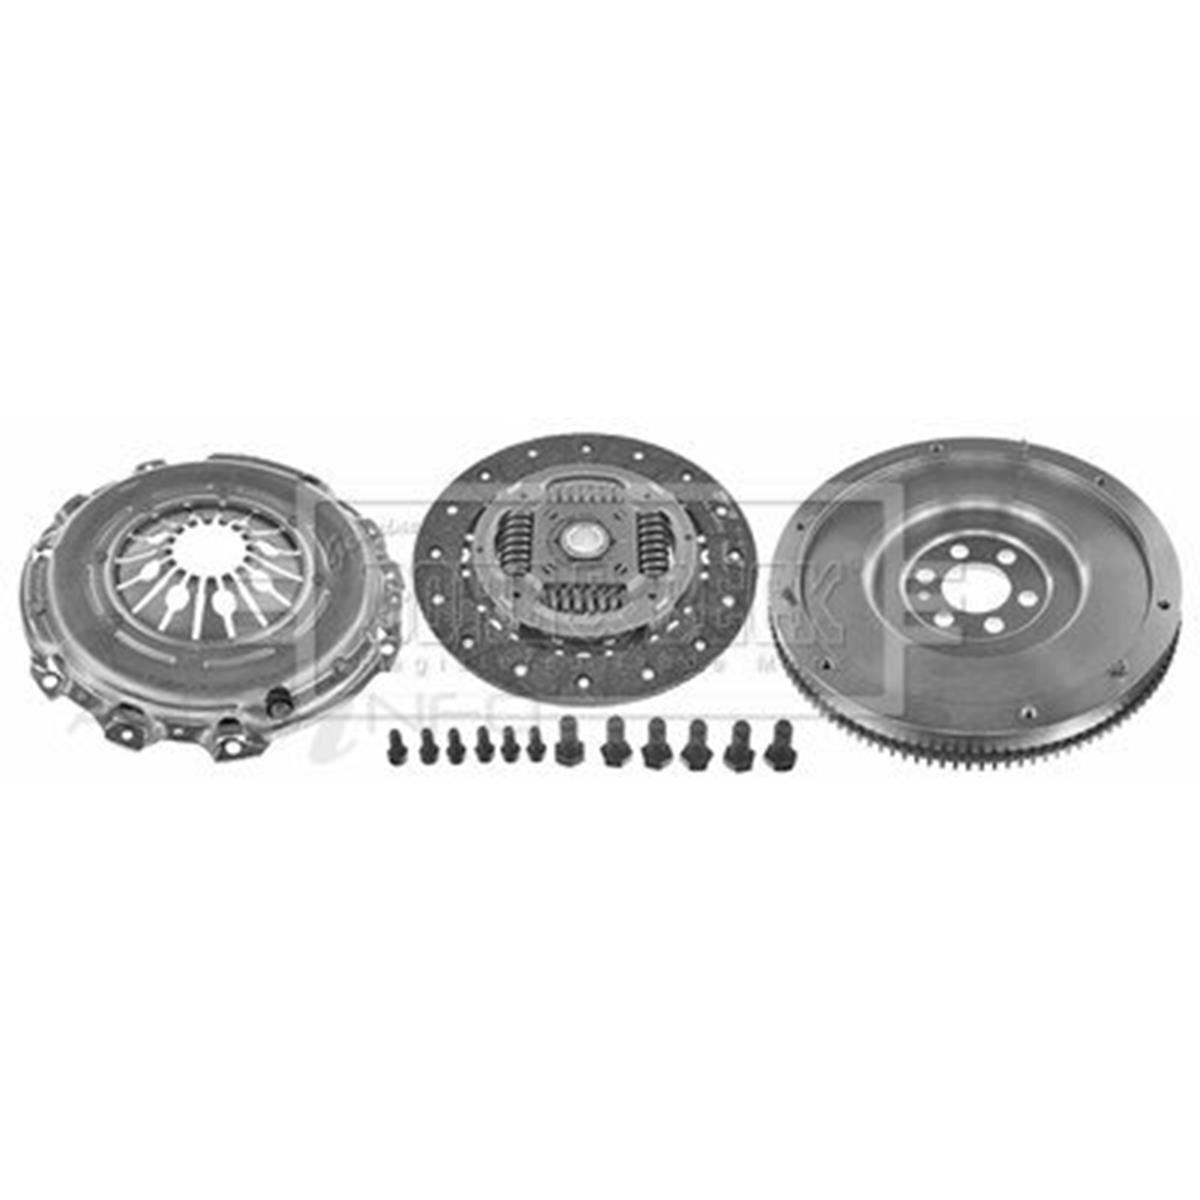 Borg /& Beck HKT1050 Clutch 3-in-1 CSC Kit